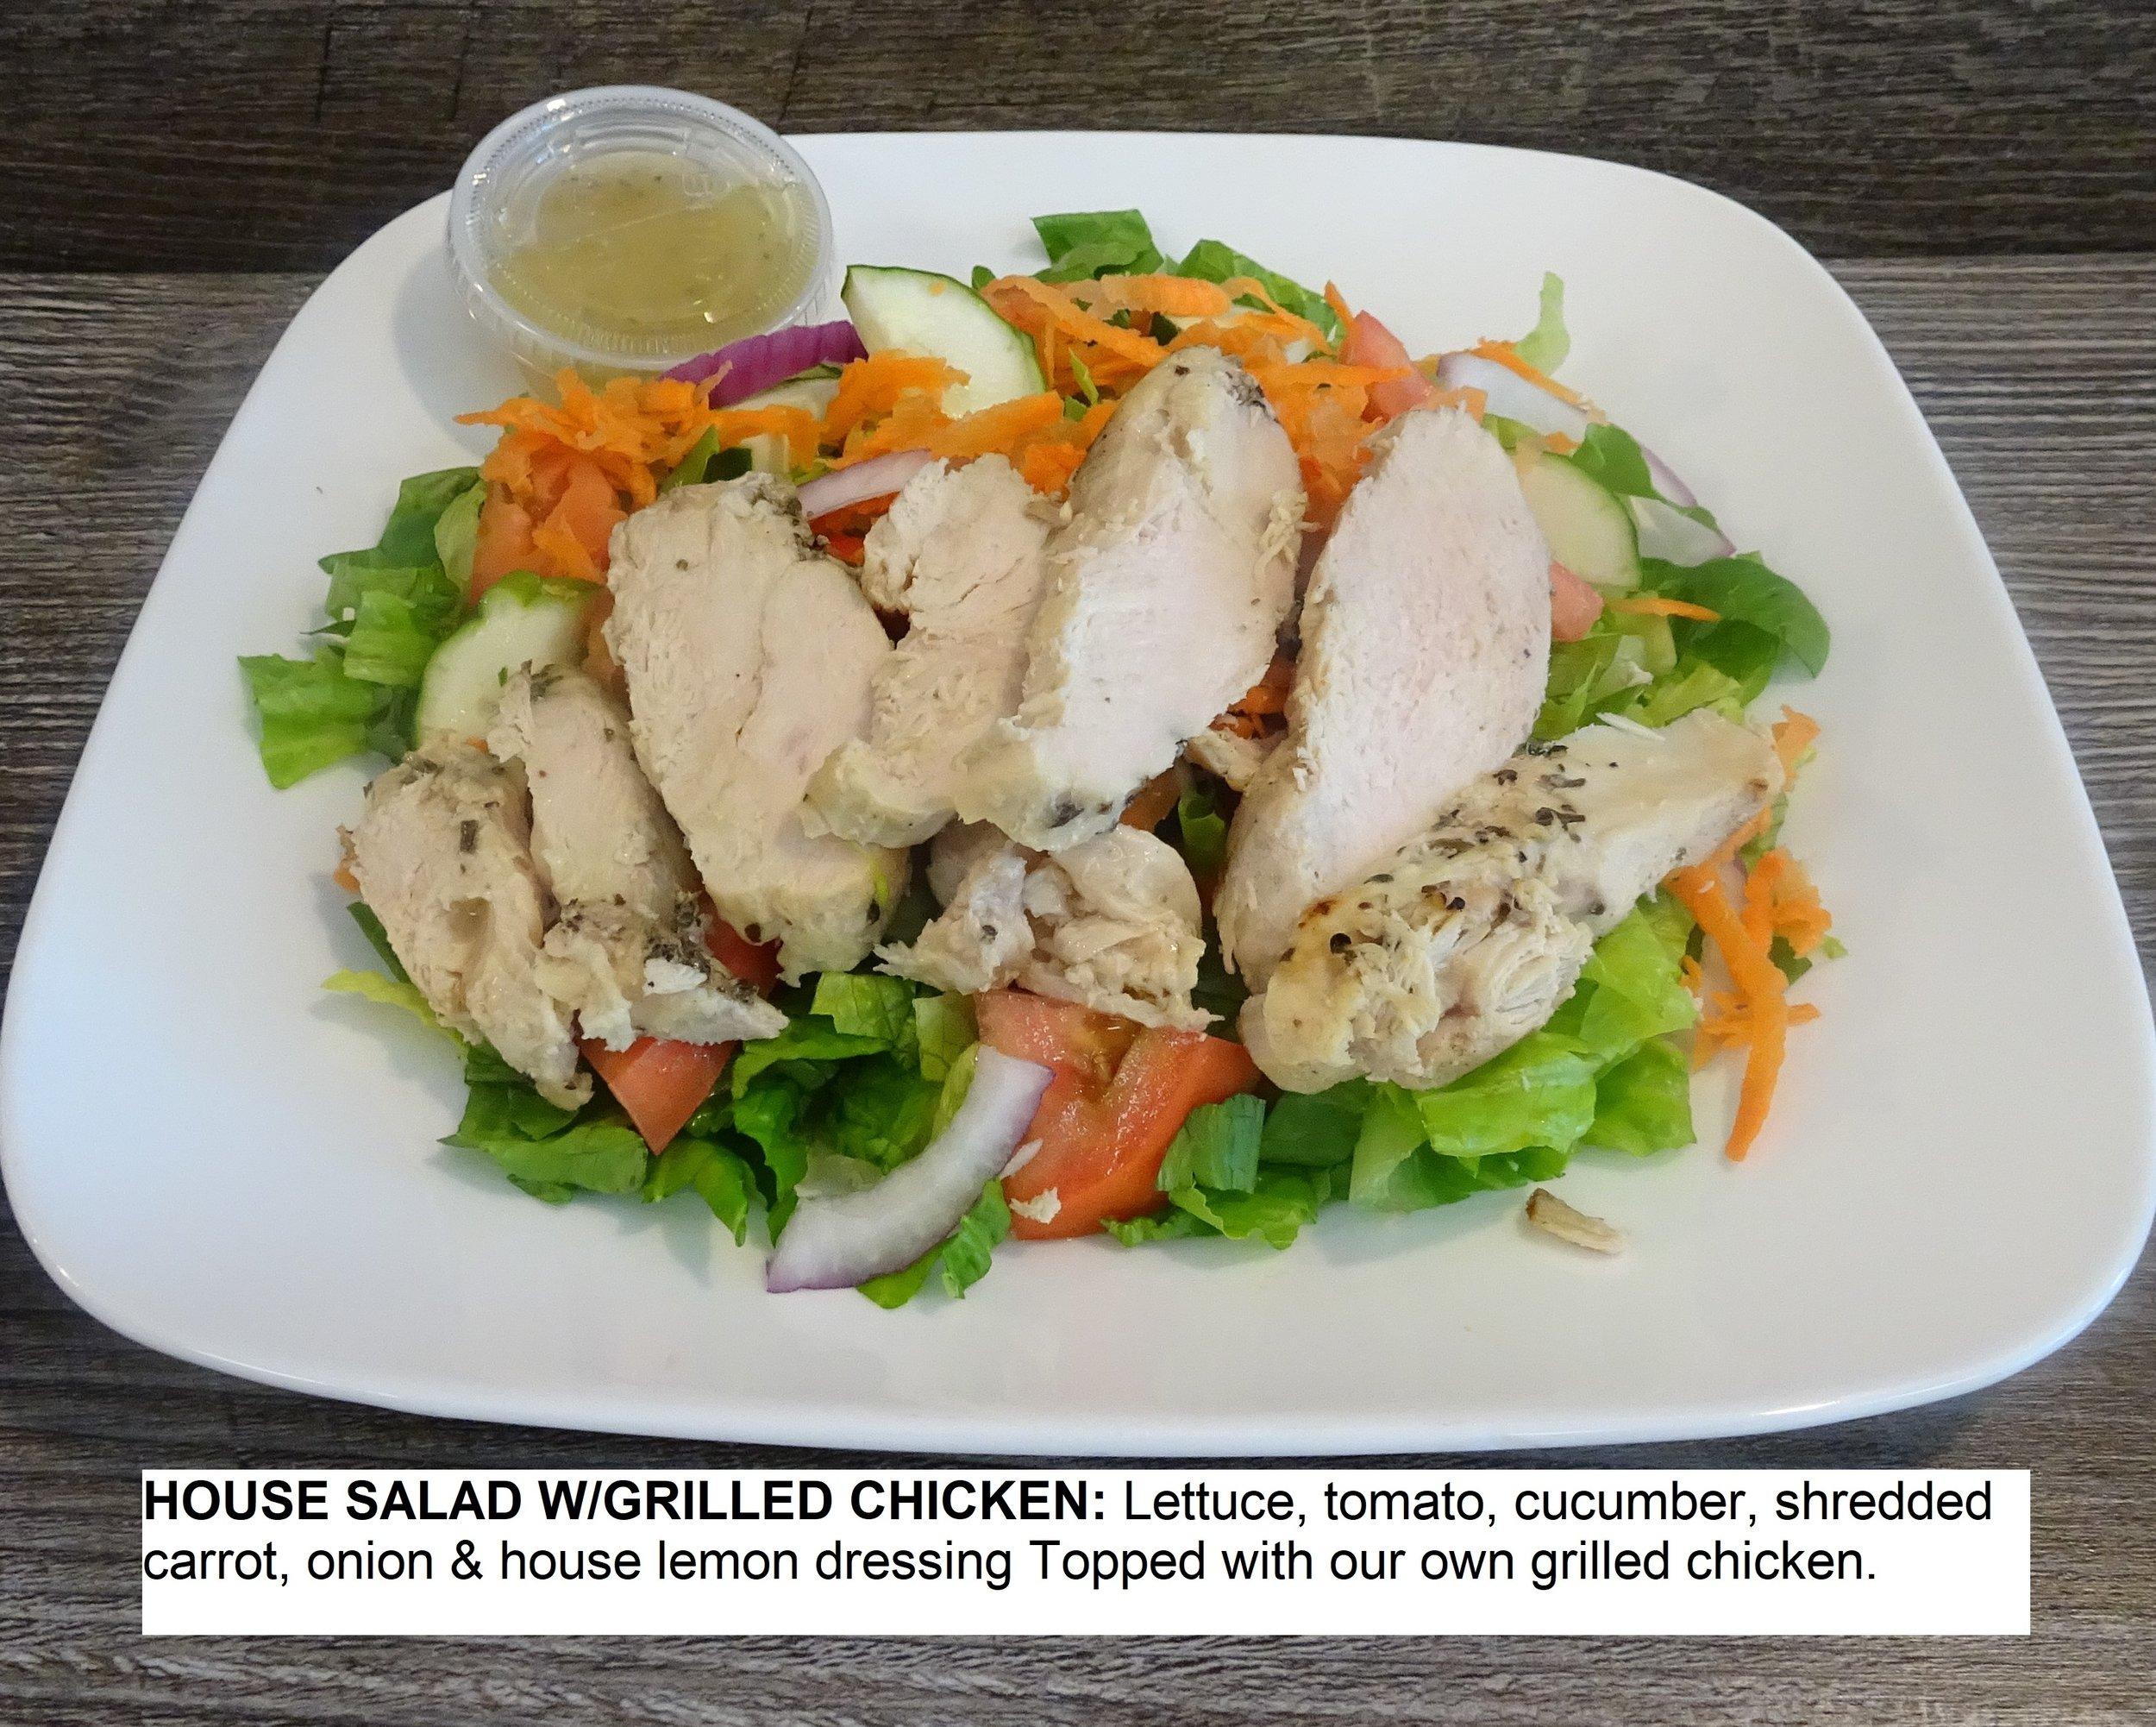 HouseSalad w chicken.jpg